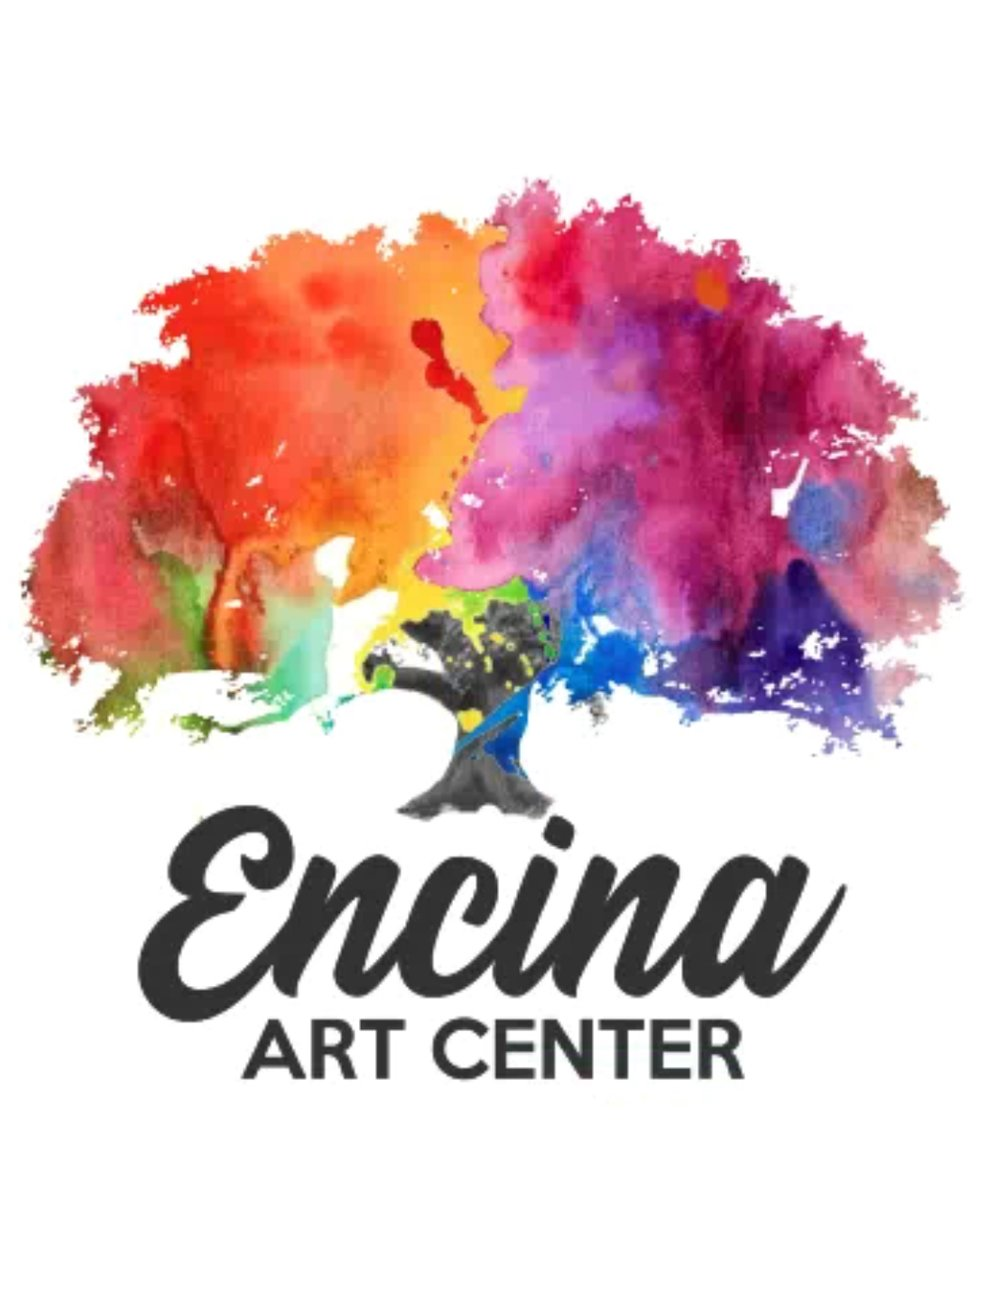 Encina Art Center Logo 020119 - Carol Kothmann.jpeg